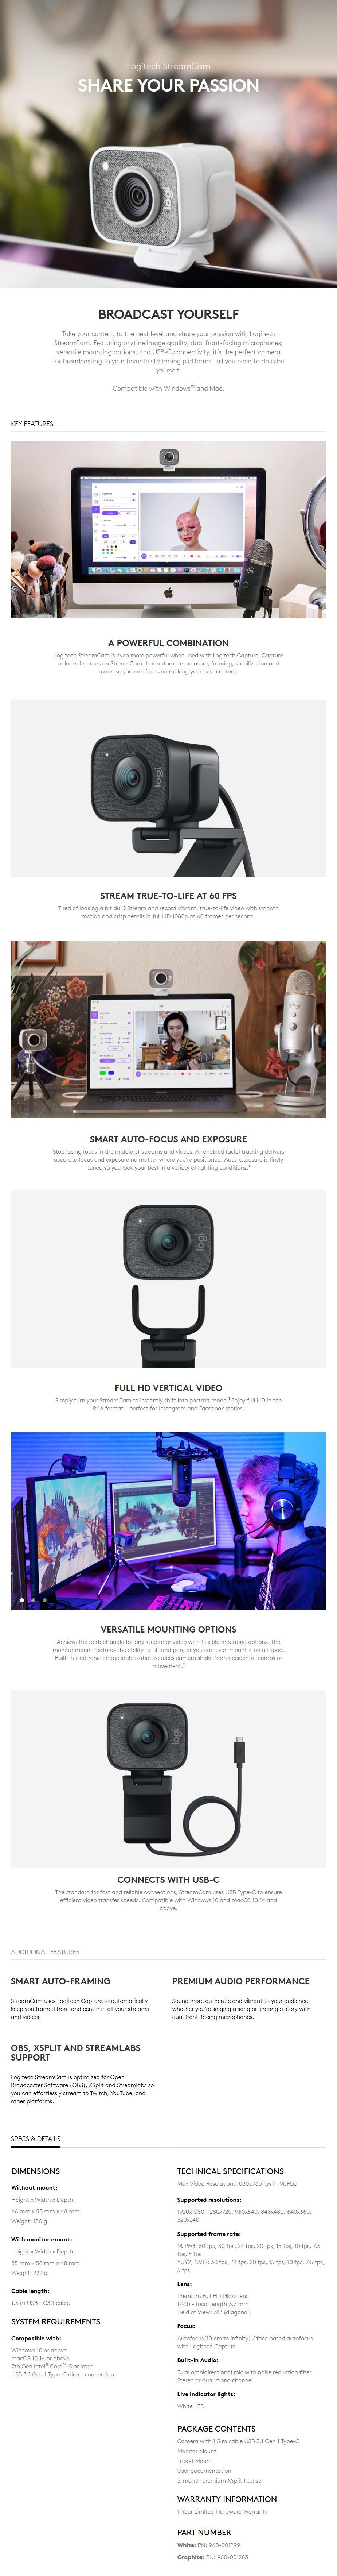 logitech-streamcam-full-hd-usbc-webcam-graphite-ac34491-6-1-.jpg